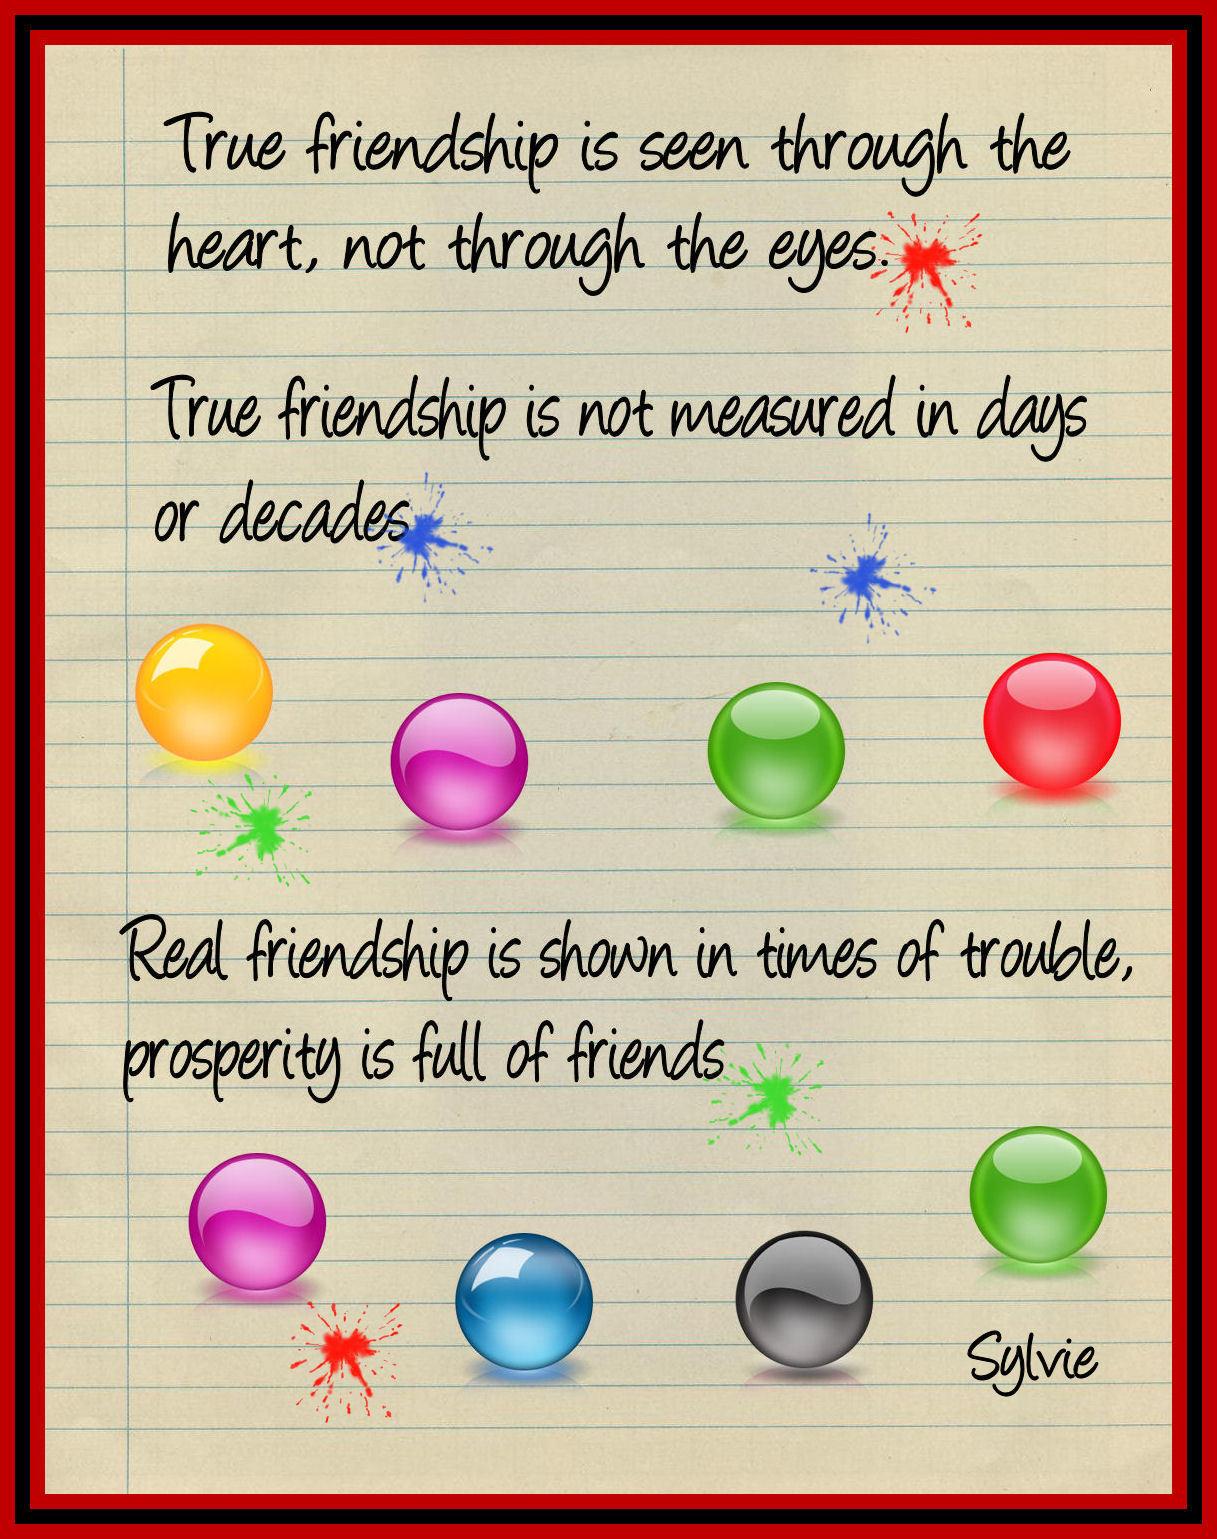 Kata Mutiara Tentang Persahabatan Terbaik Penuh Makna